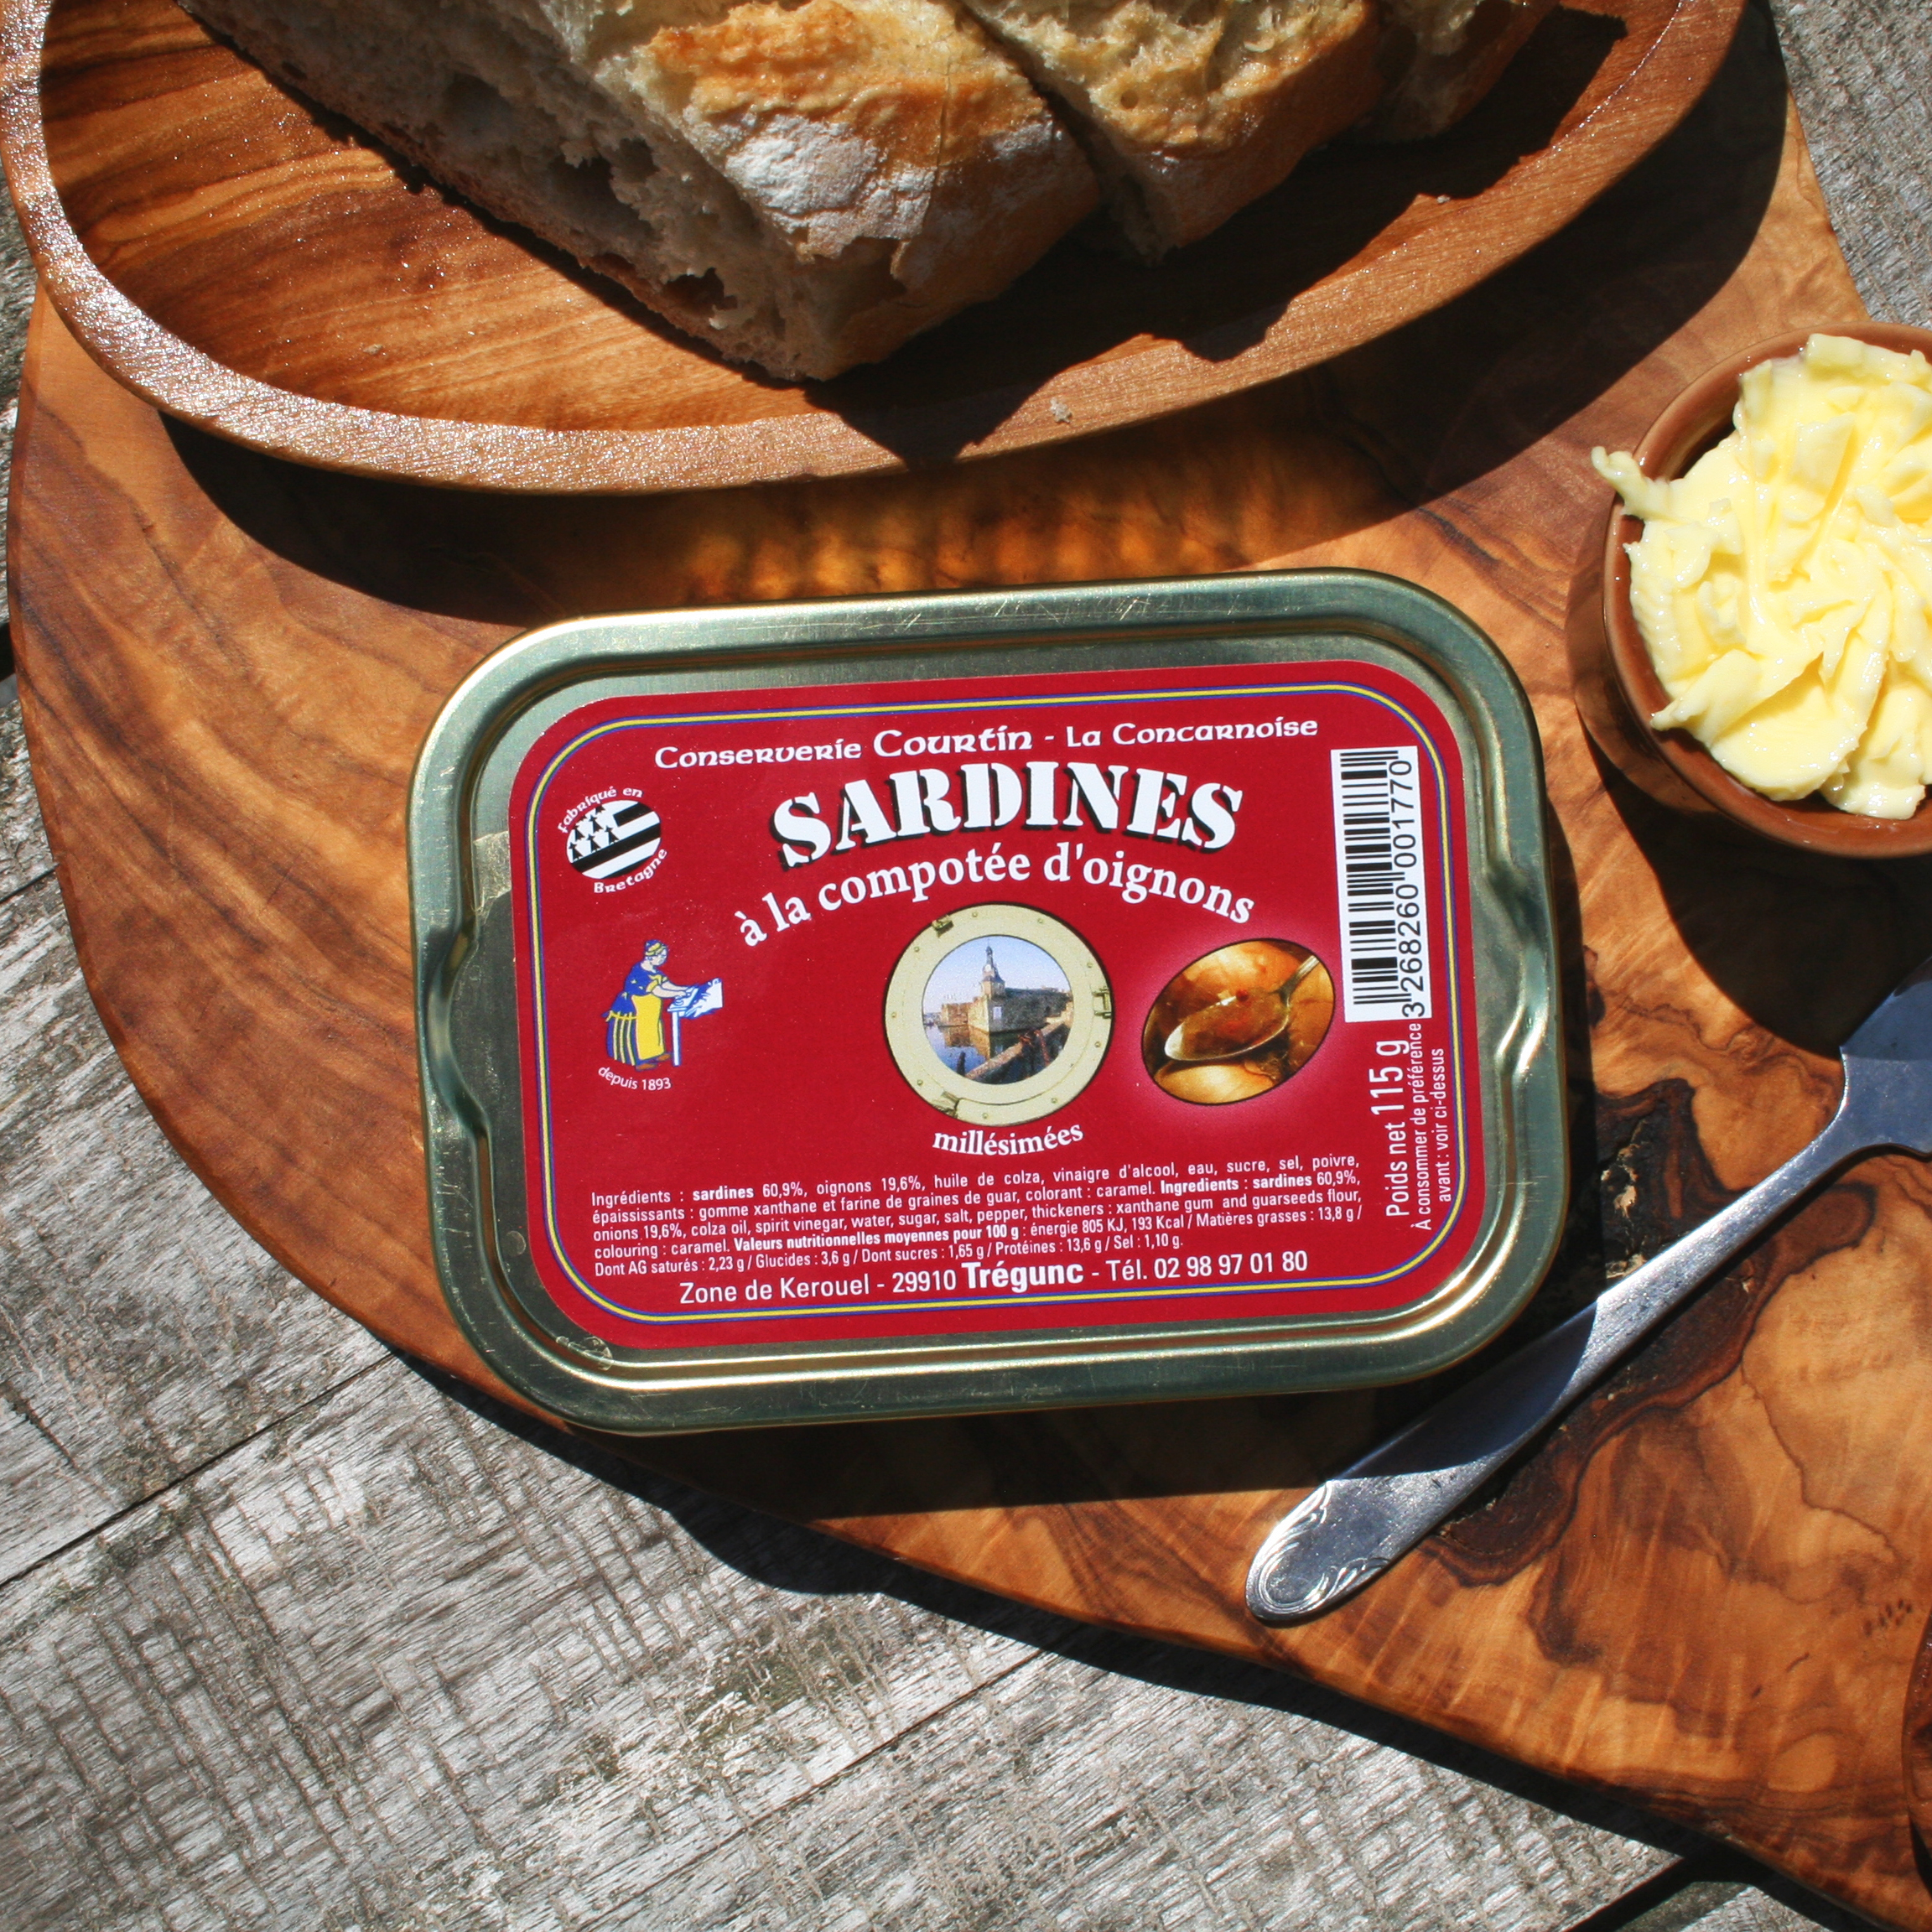 Sardines Courtin Concarneau Bretagne Frankrijk conserven delicatesse gezond premium